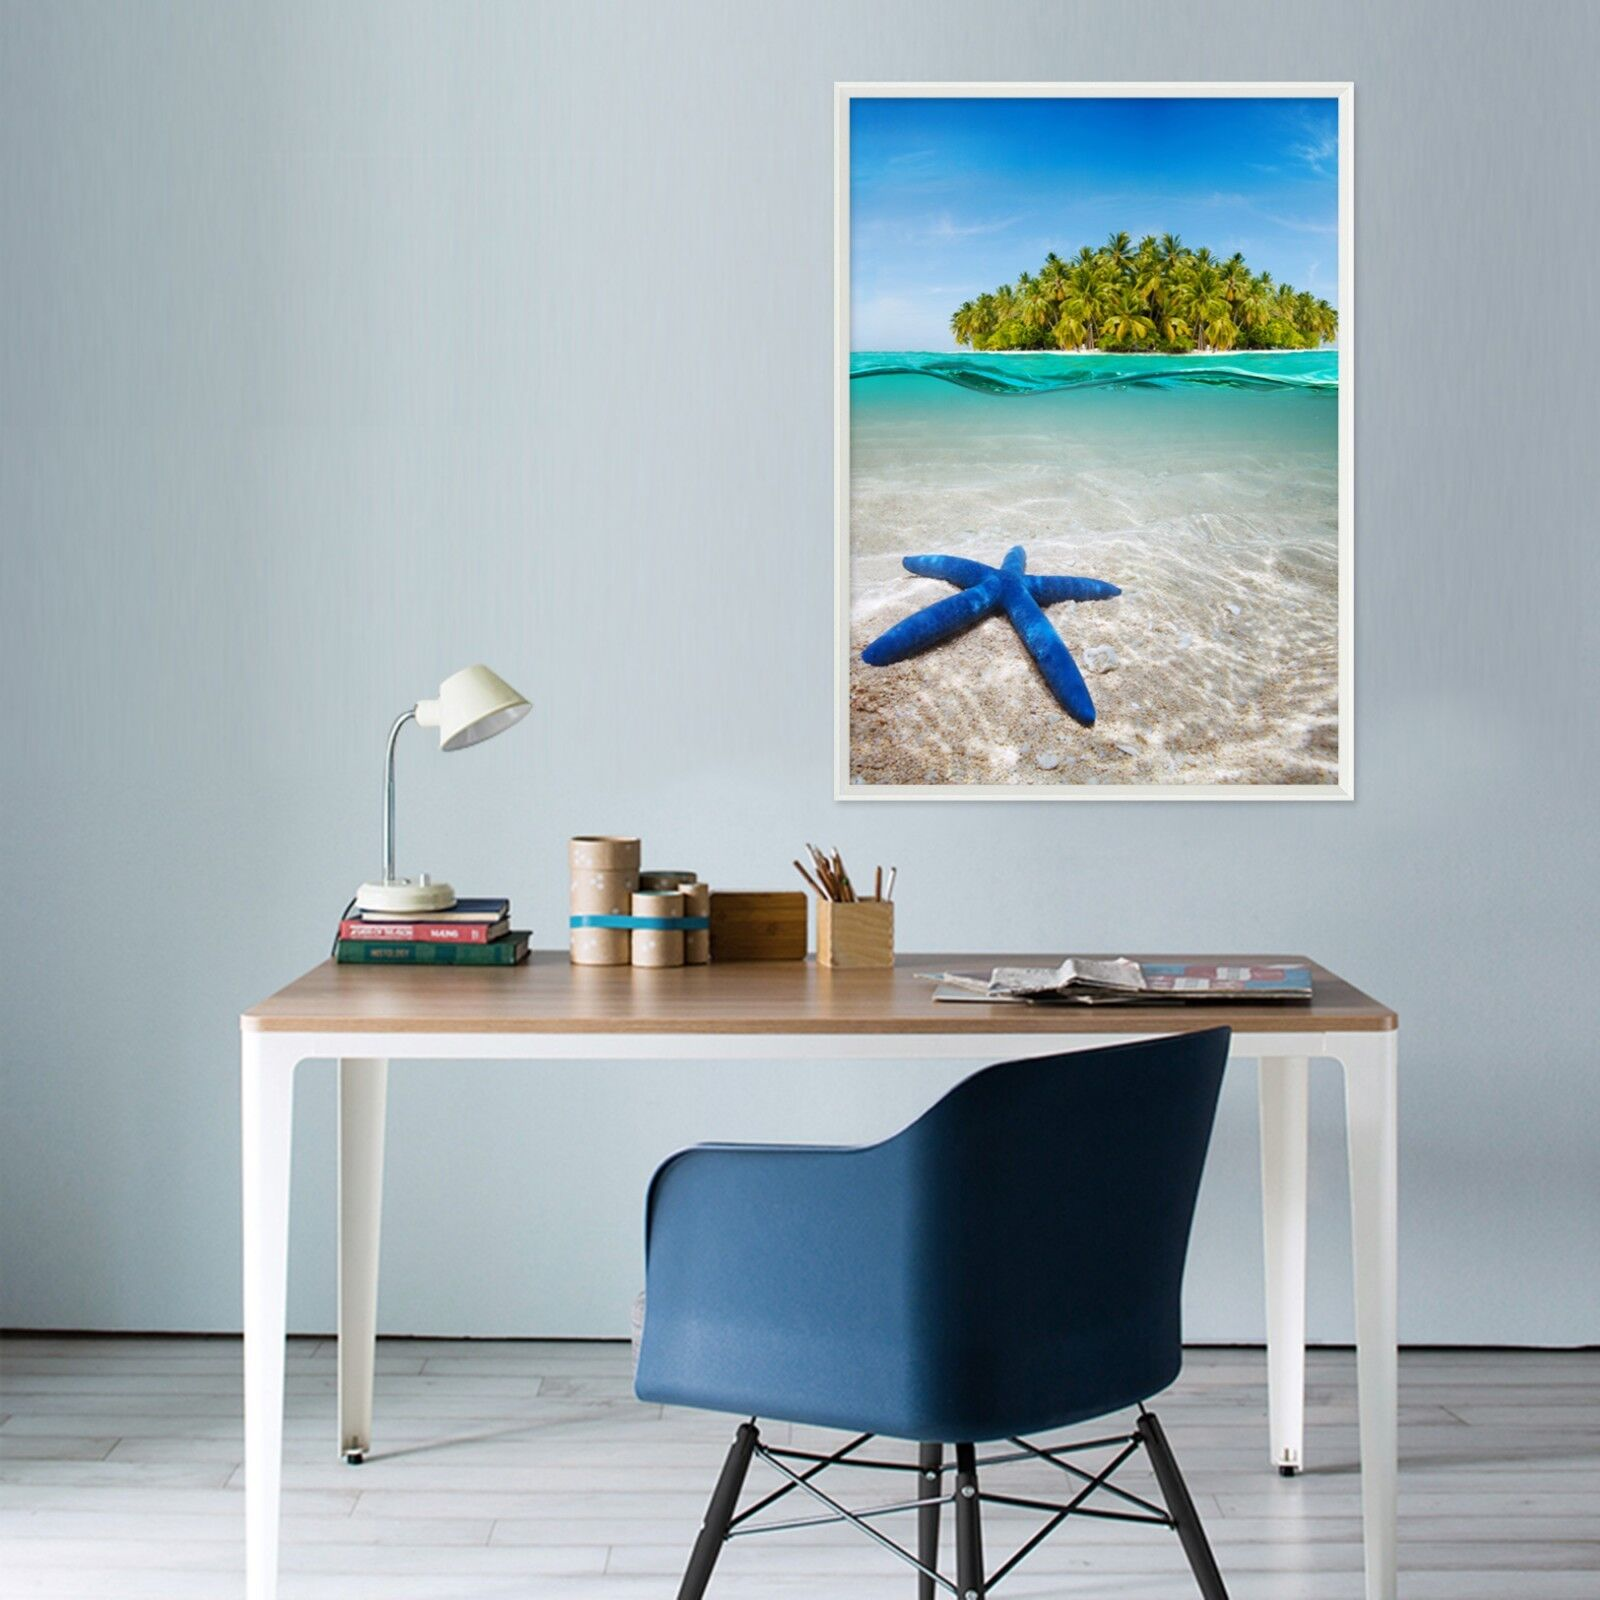 3D Starfish Jungle Island 1 Framed Poster Home Decor Drucken Painting AJ WandPapier